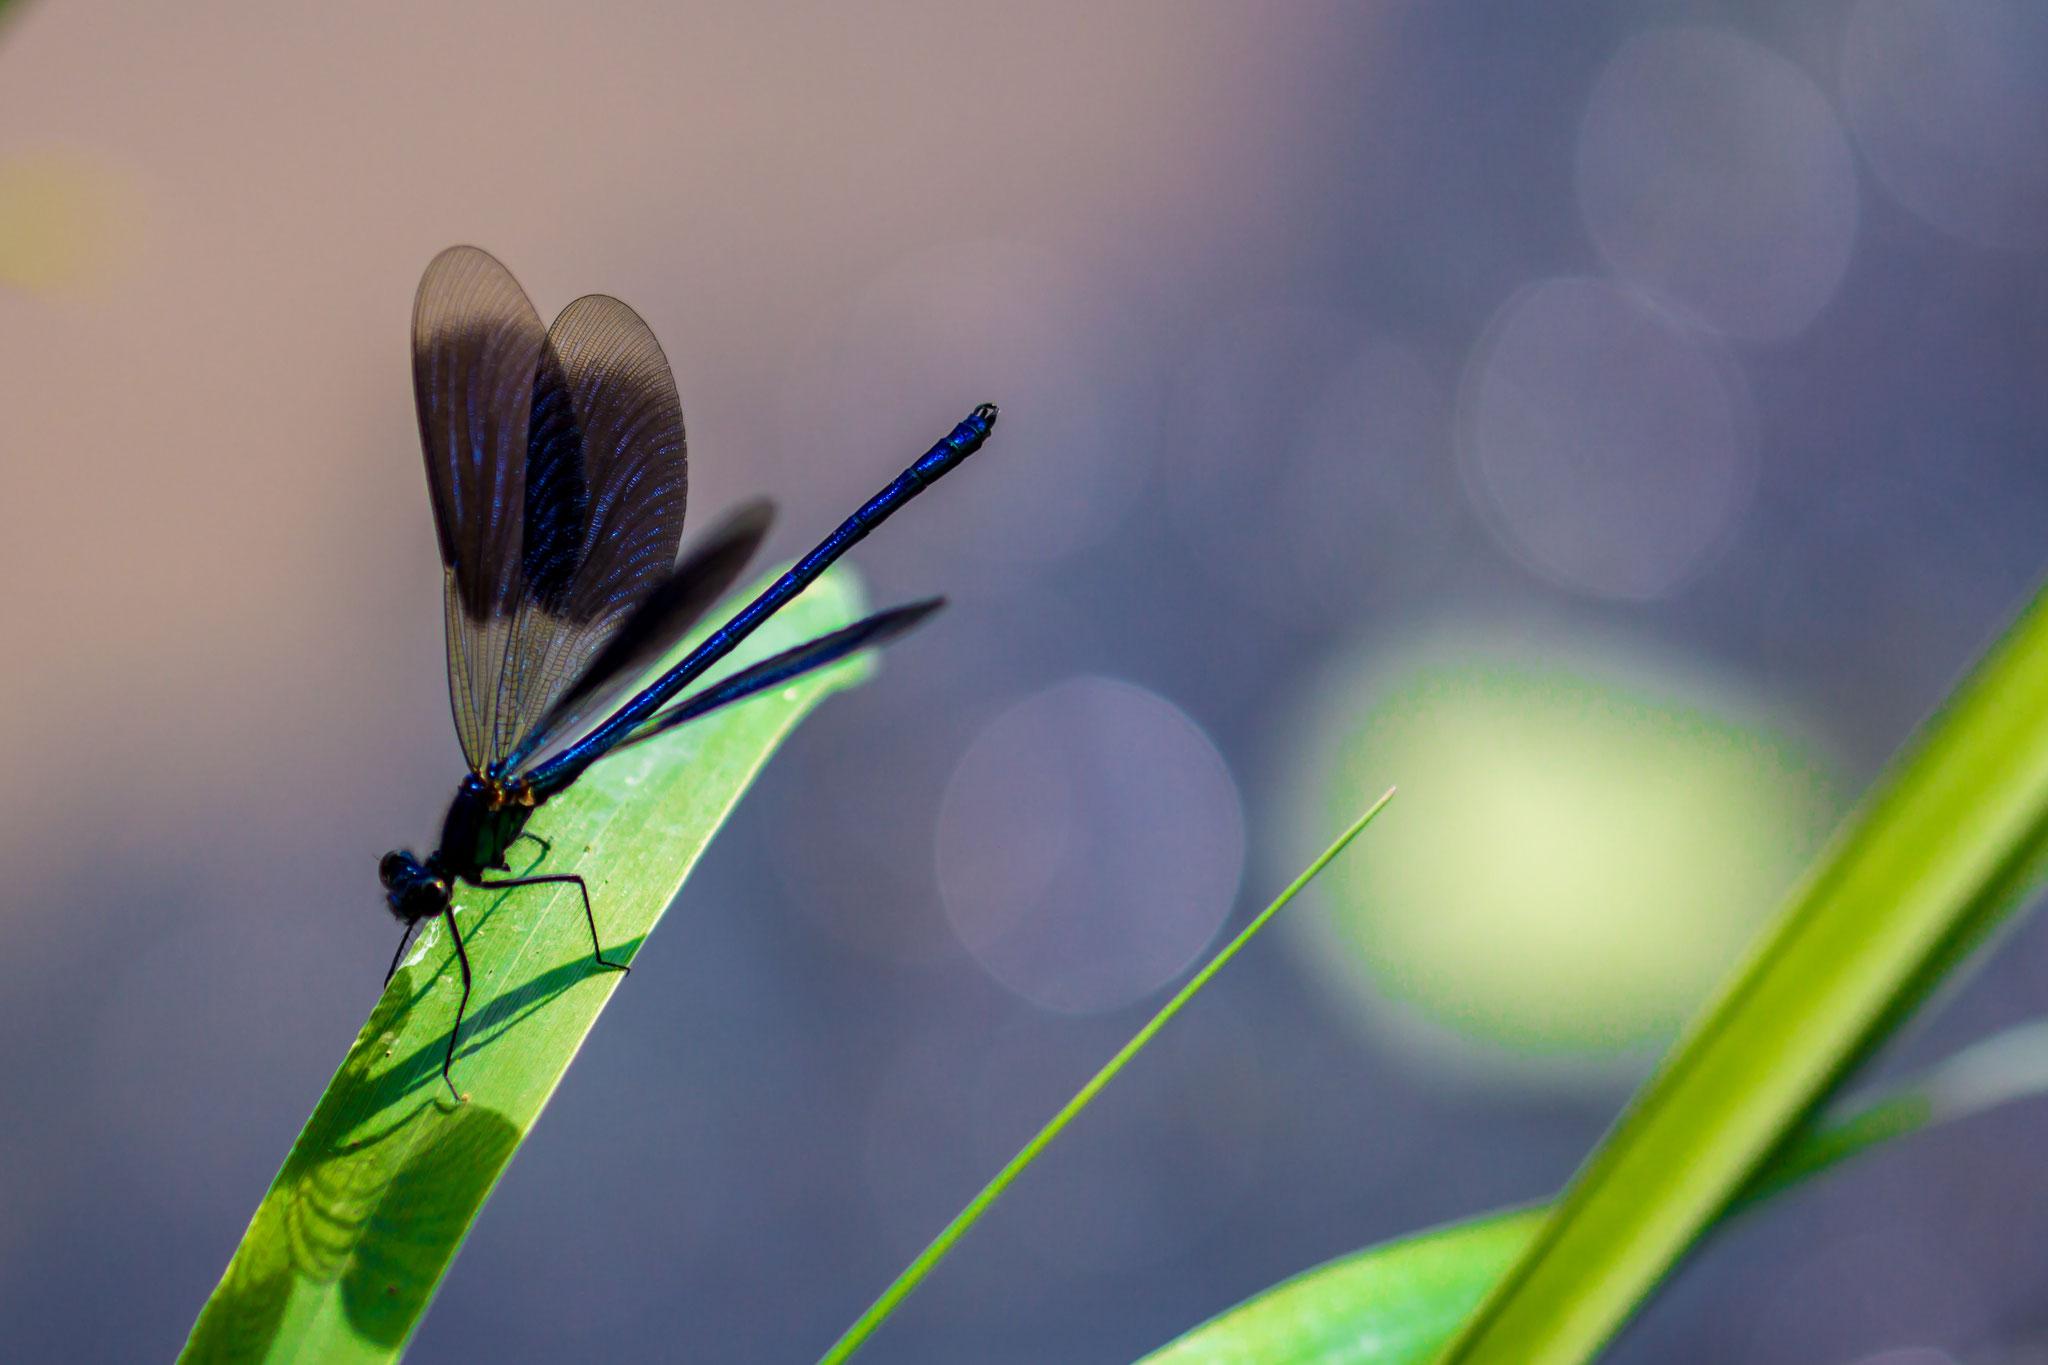 31_Libelle im Naturschutzgebiet Mönchbruch.